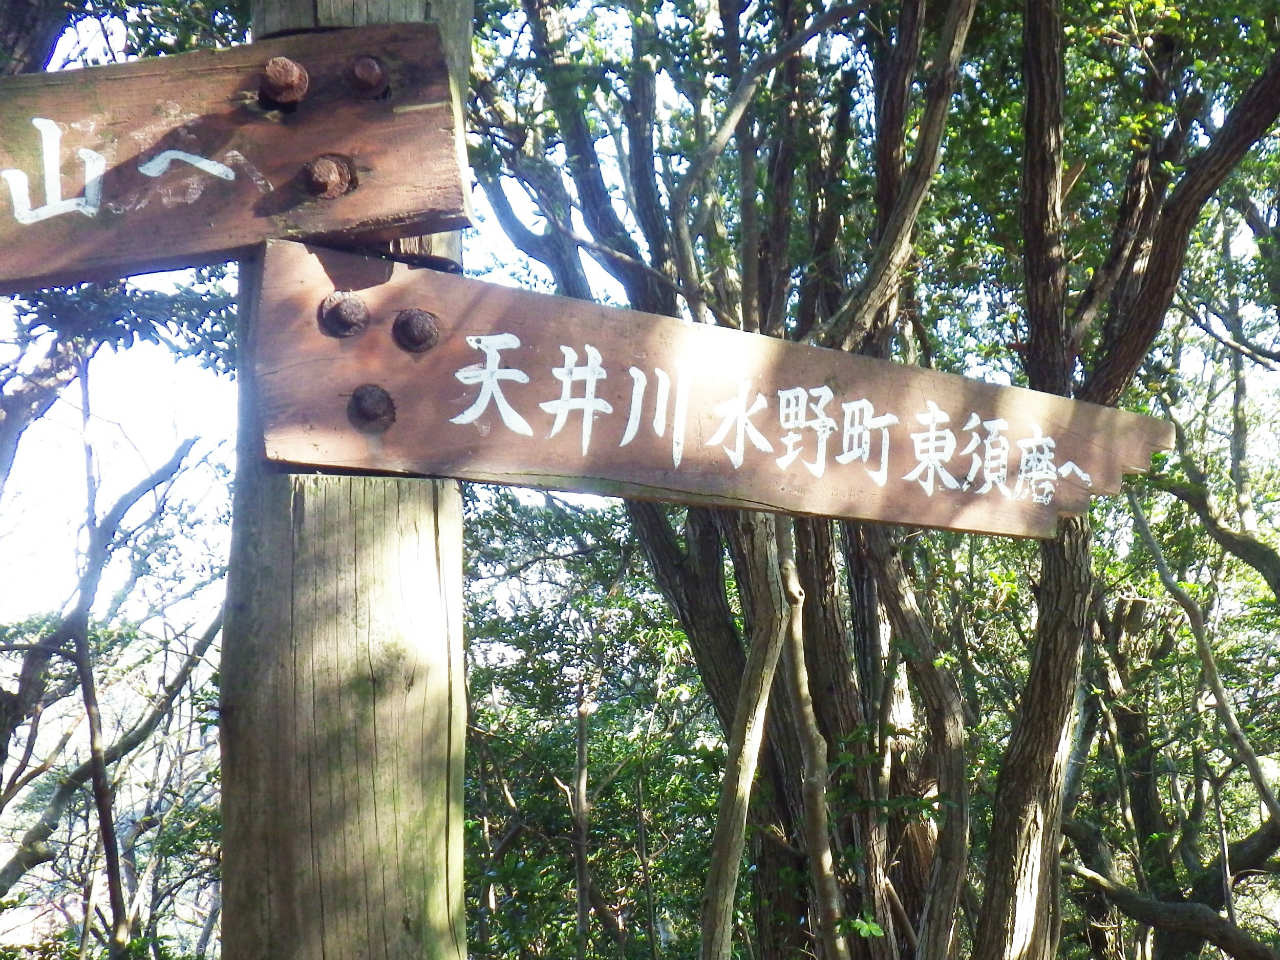 13a 天井川方面への標識